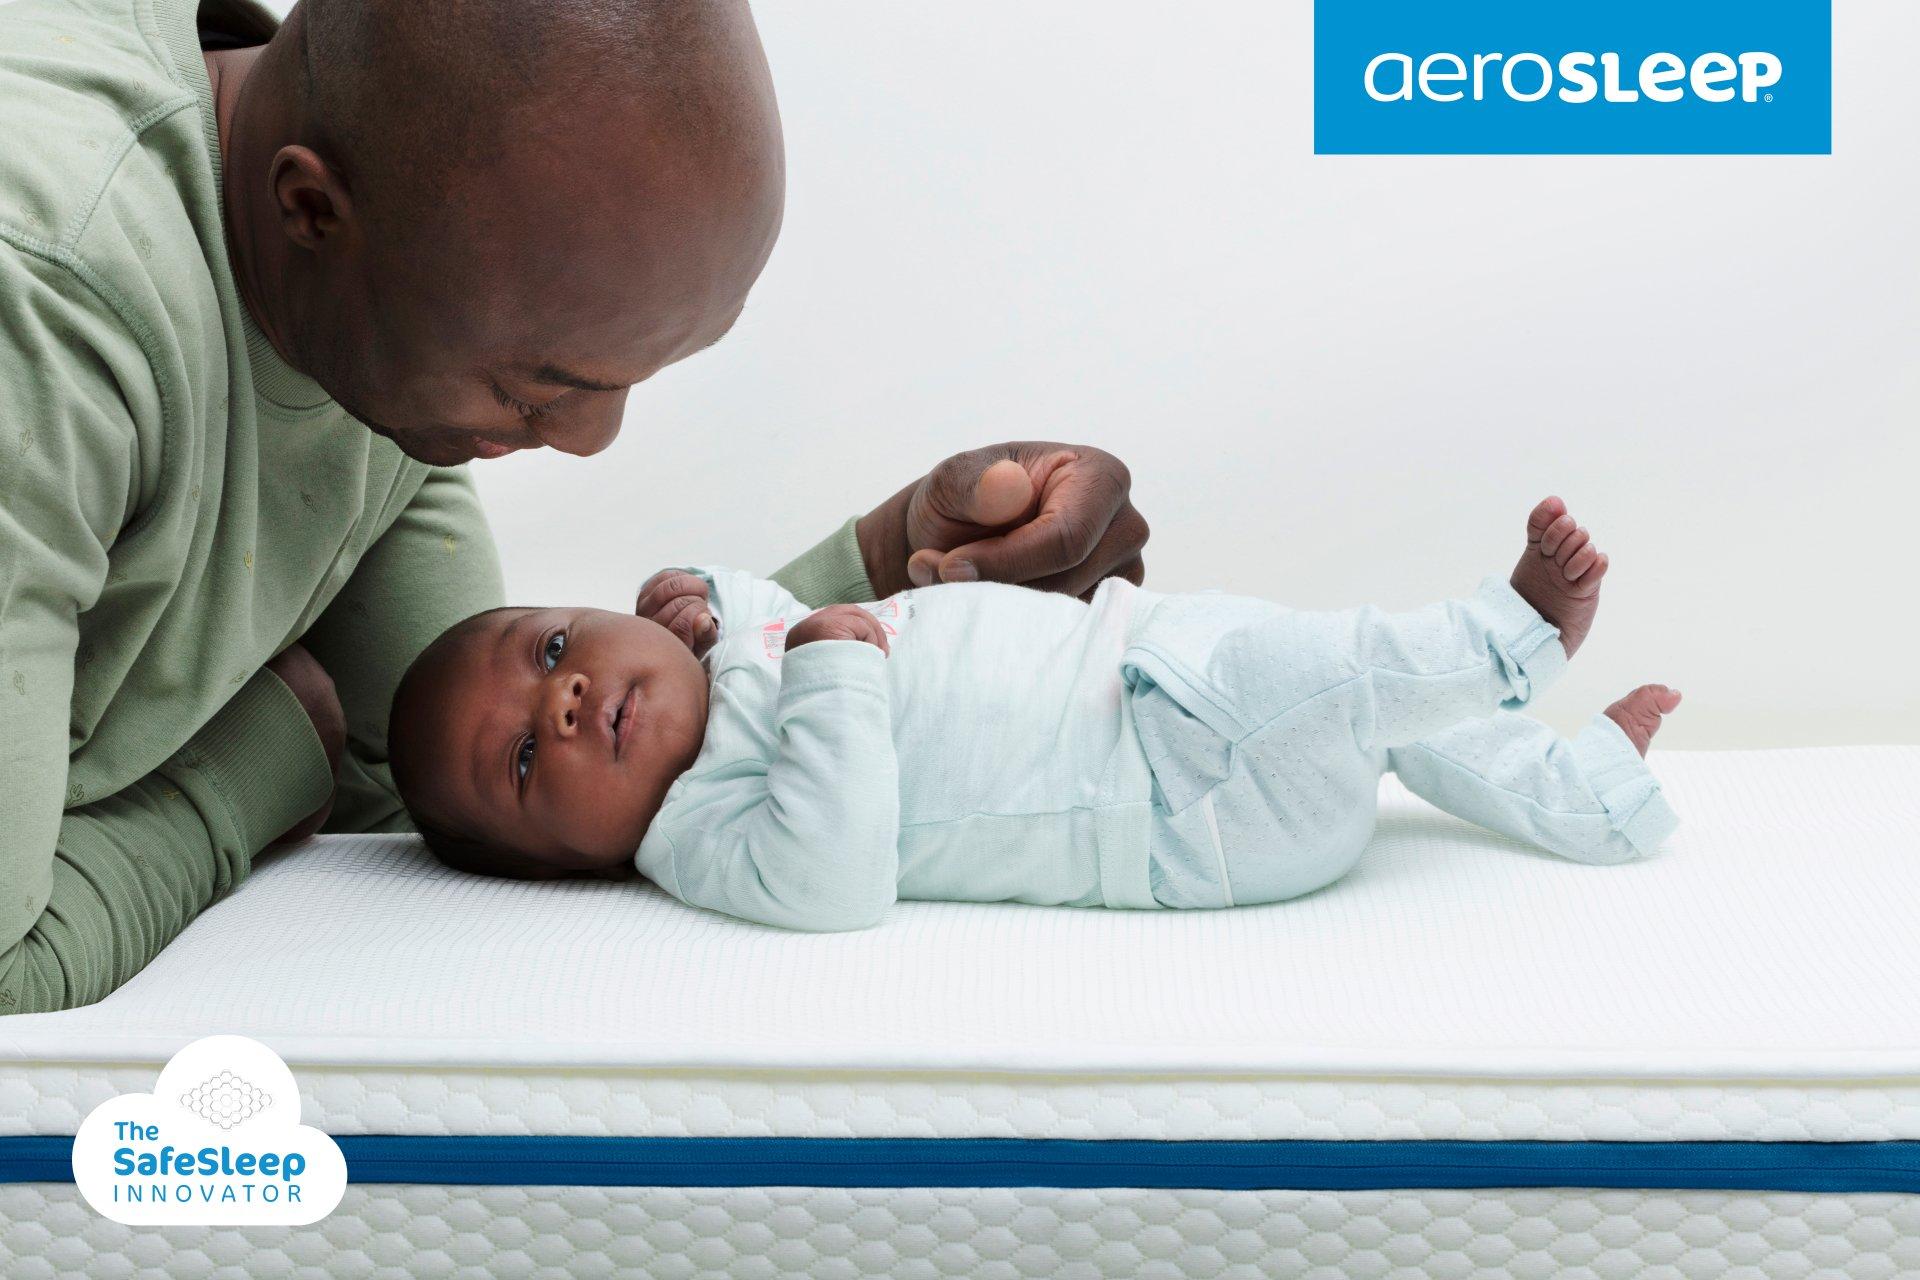 Aerosleep Matras Baby : Матрас aerosleep sleep safe packs evolution 70 x 140 cm Купить на